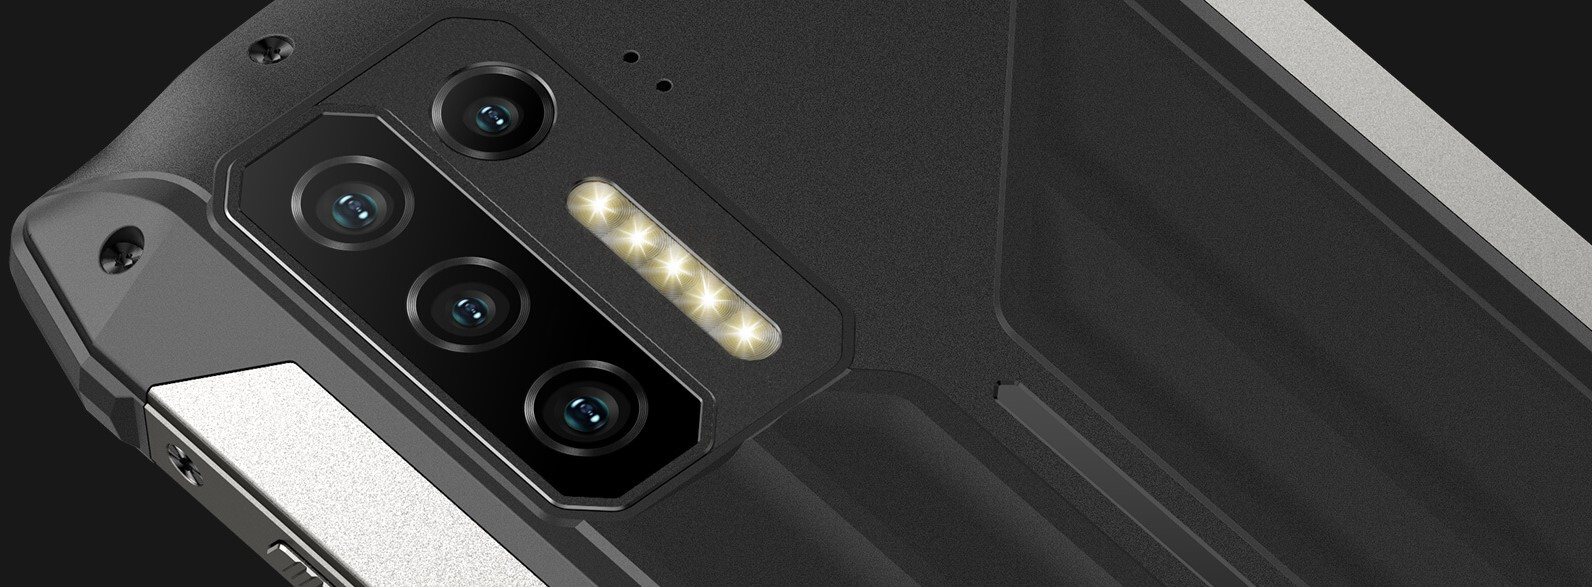 Ulefone Power Armor 13 Camera